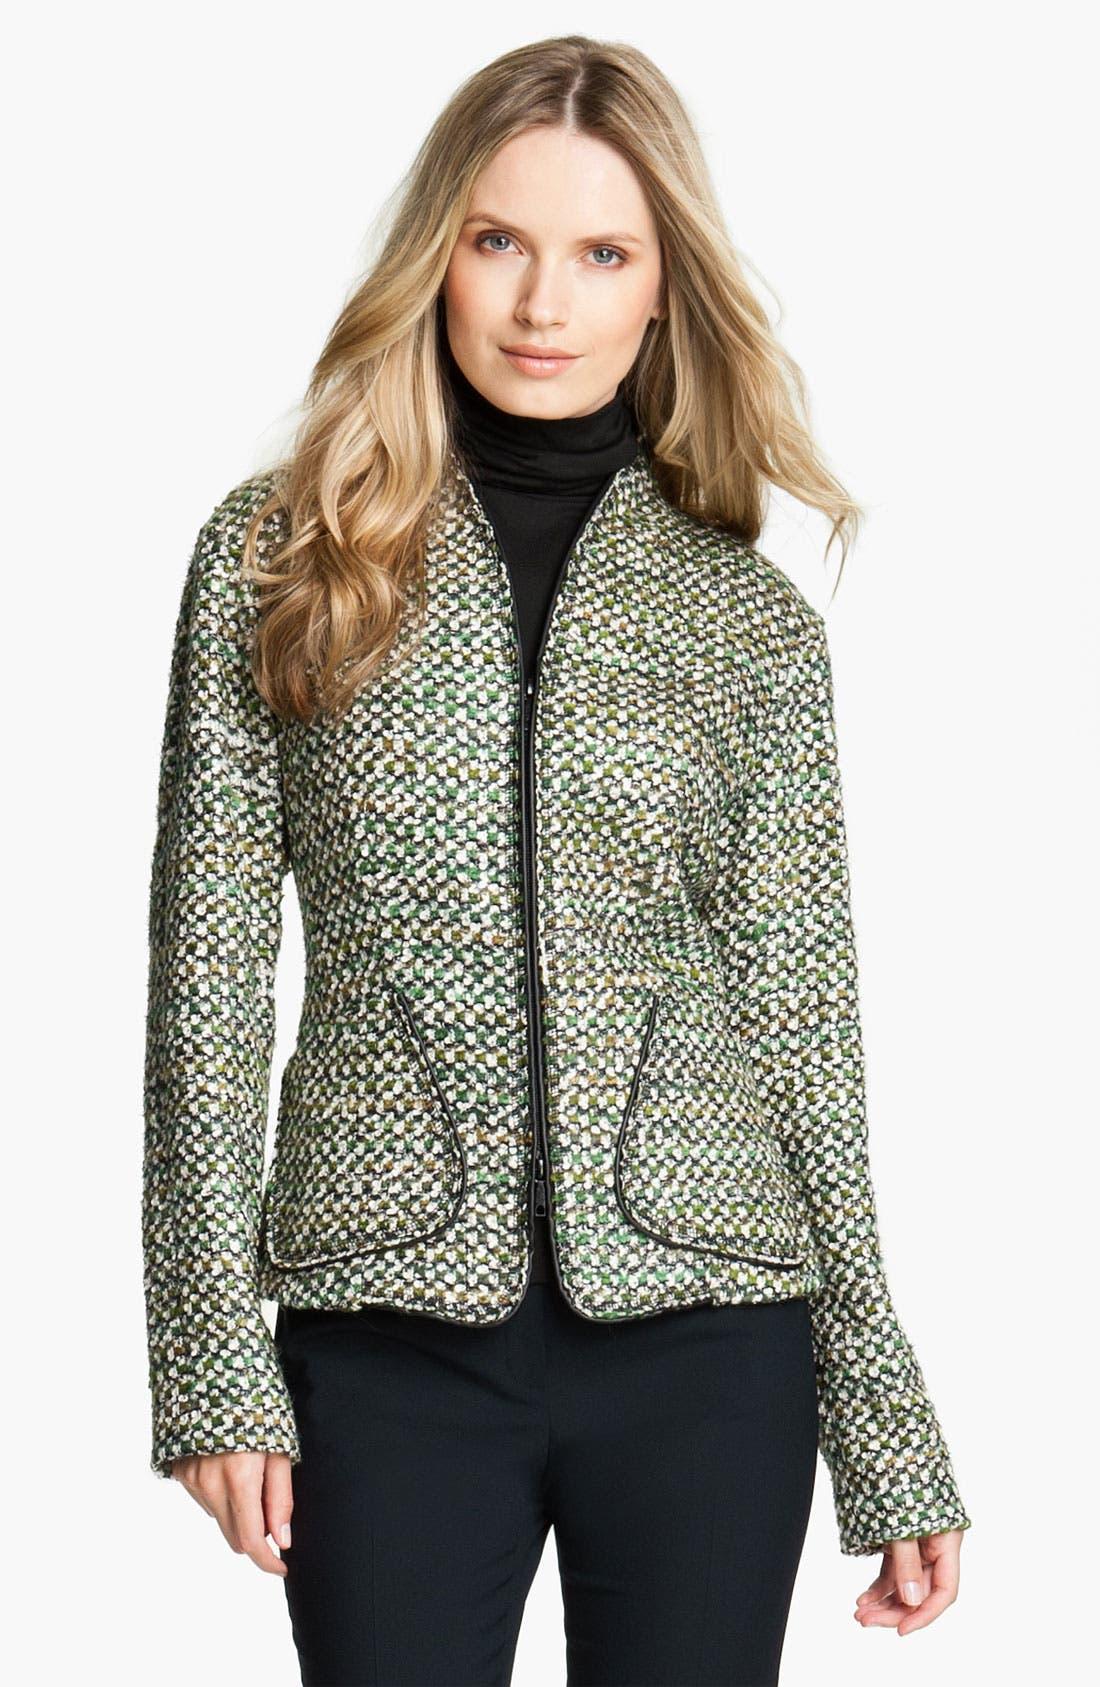 Alternate Image 1 Selected - Lafayette 148 New York 'Hierarchy' Tweed Jacket (Petite)